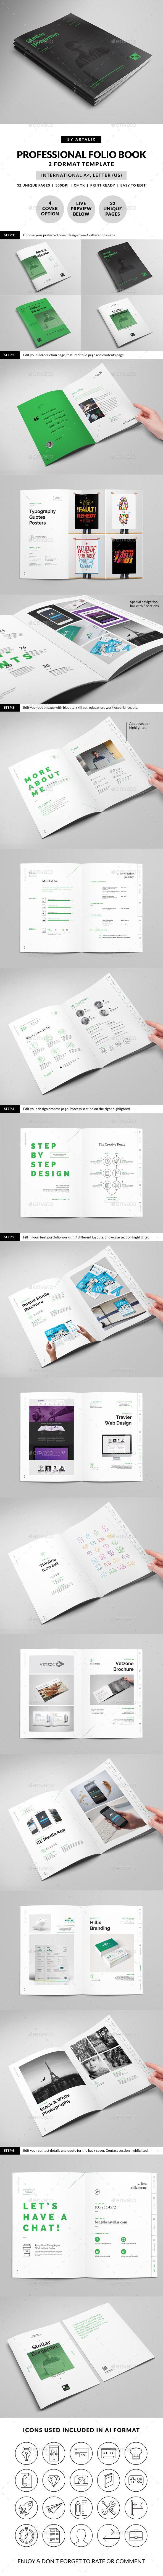 Stellar Portfolio - 32 Pages Booklet   Brochures, Indesign templates ...